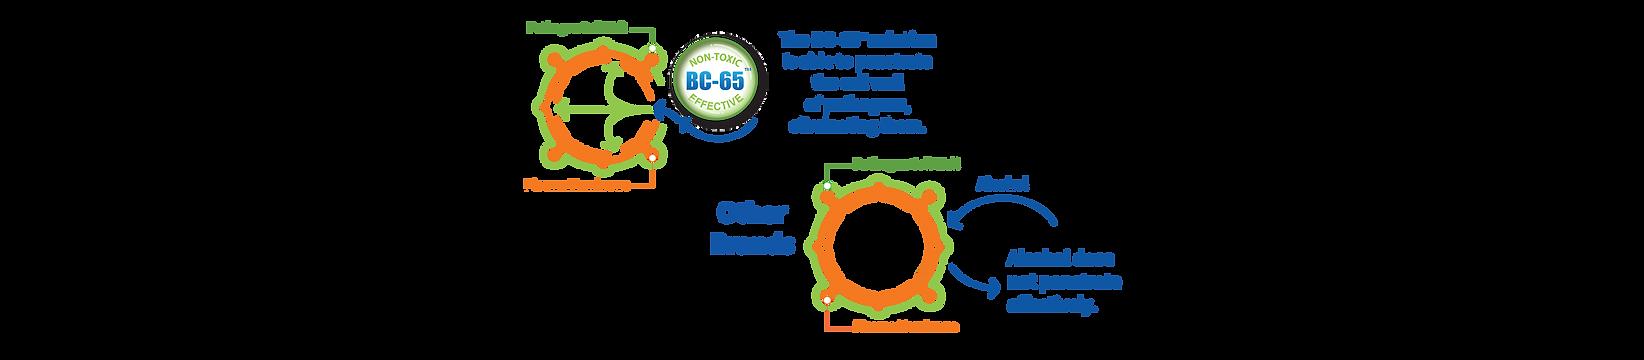 BC-65